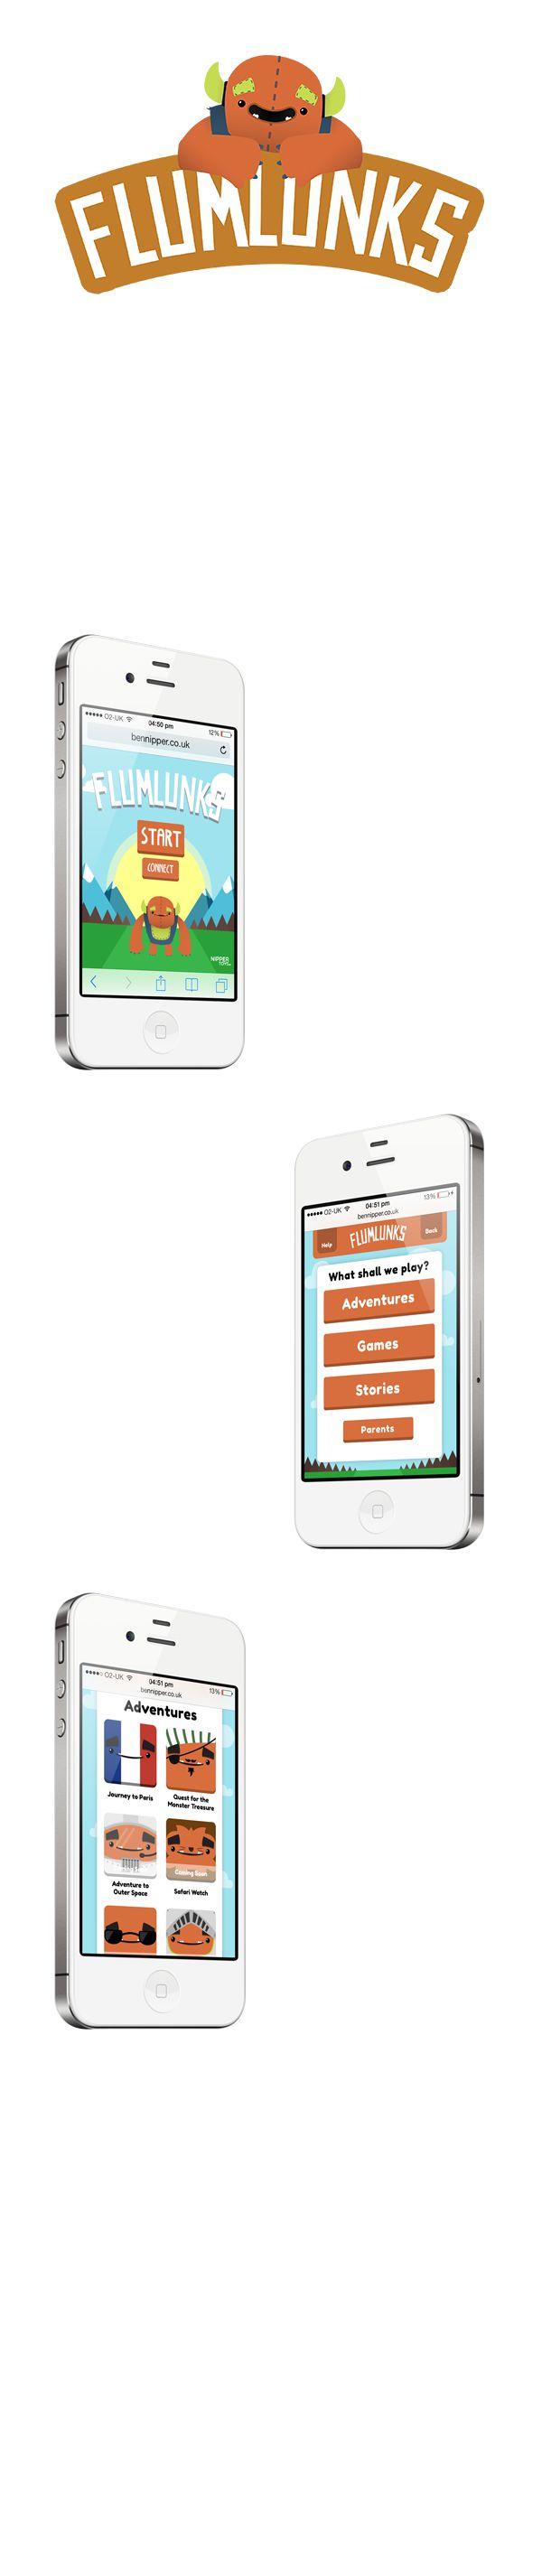 Flumlunks Application Design on Behance